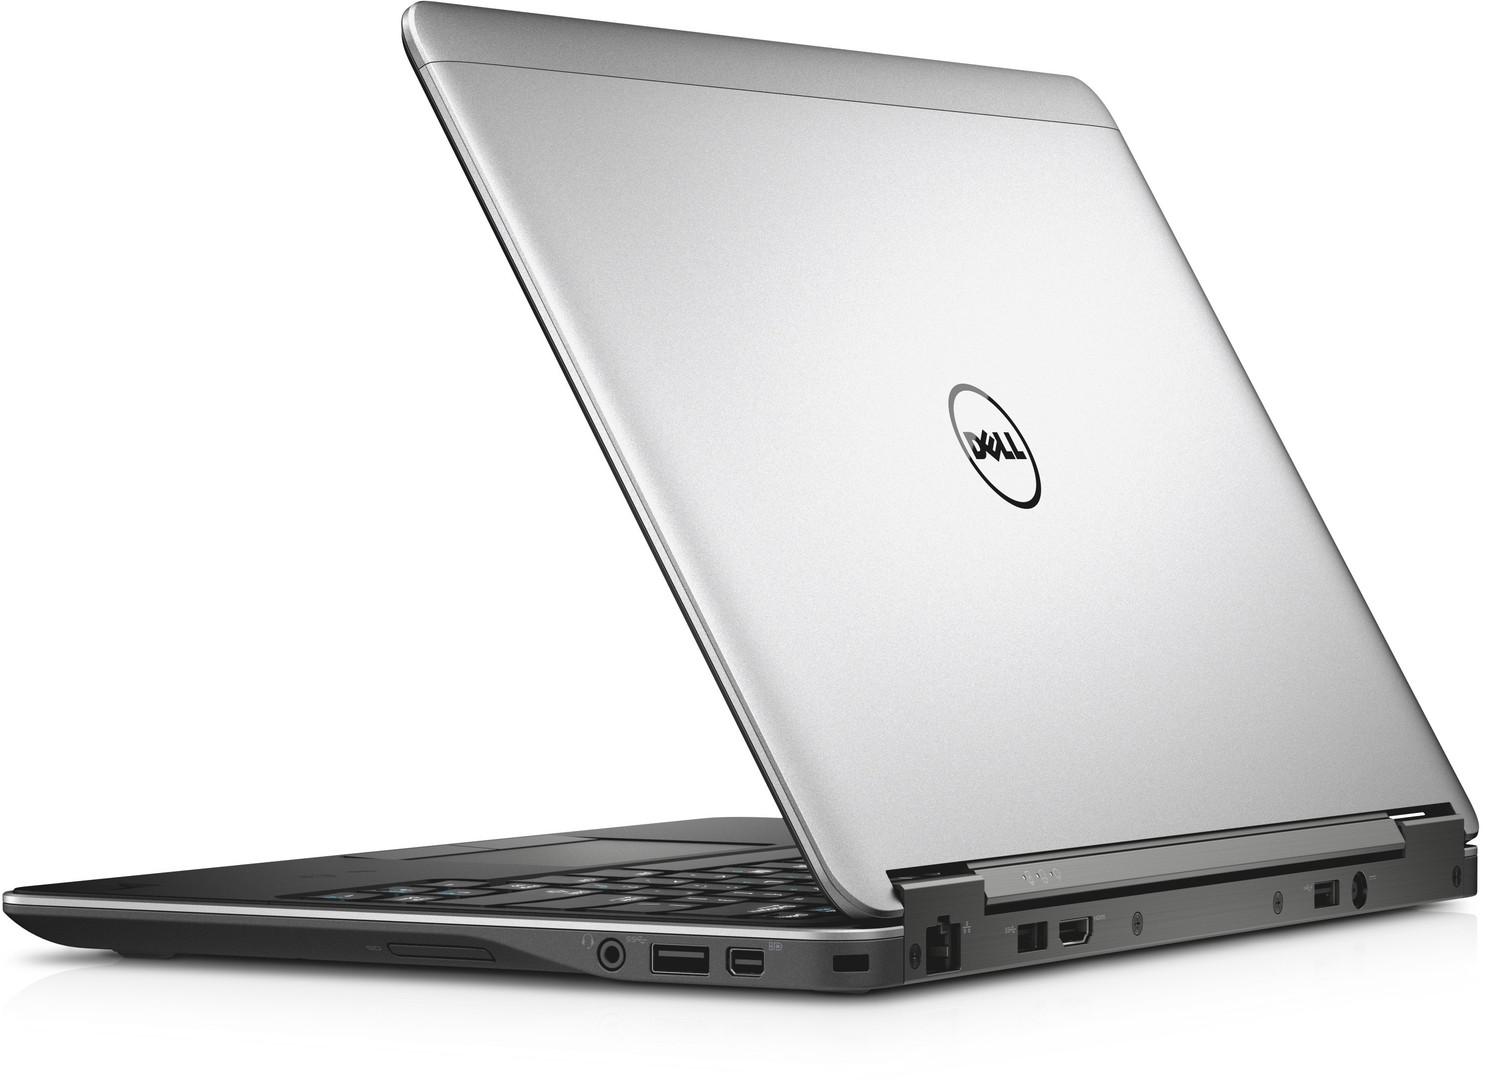 b4c925d3722 Sülearvuti Dell Latitude E7240 SSD-0